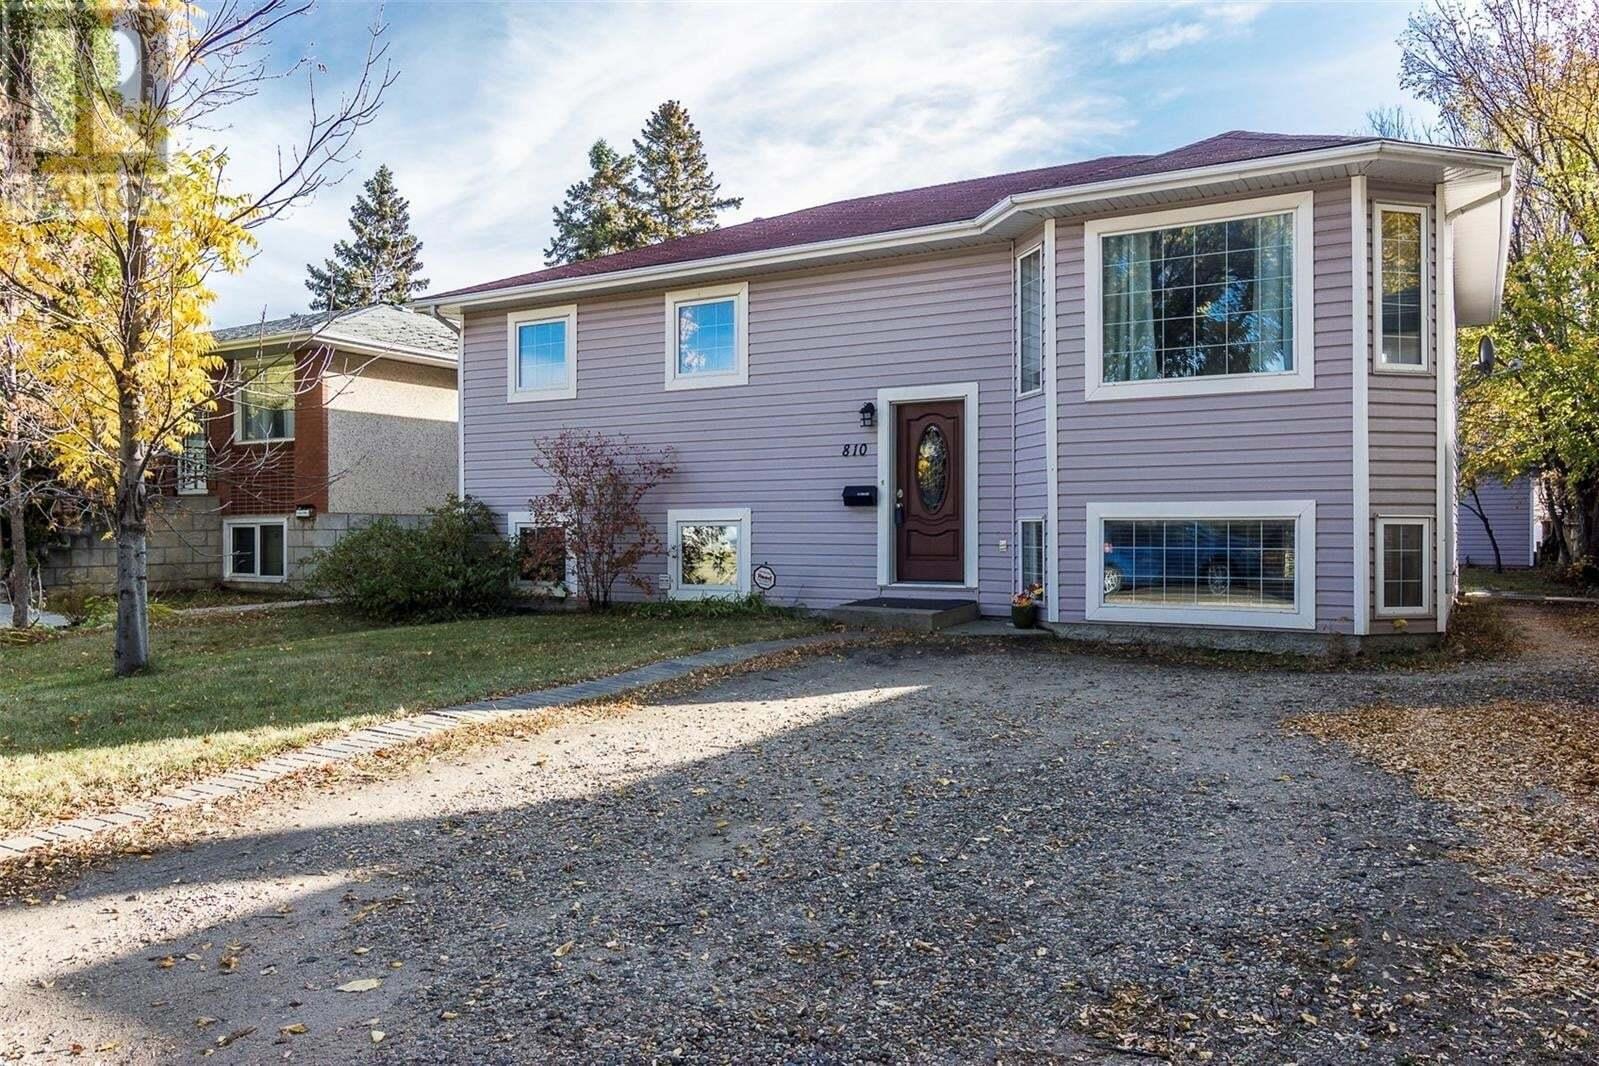 House for sale at 810 L Ave N Saskatoon Saskatchewan - MLS: SK828836